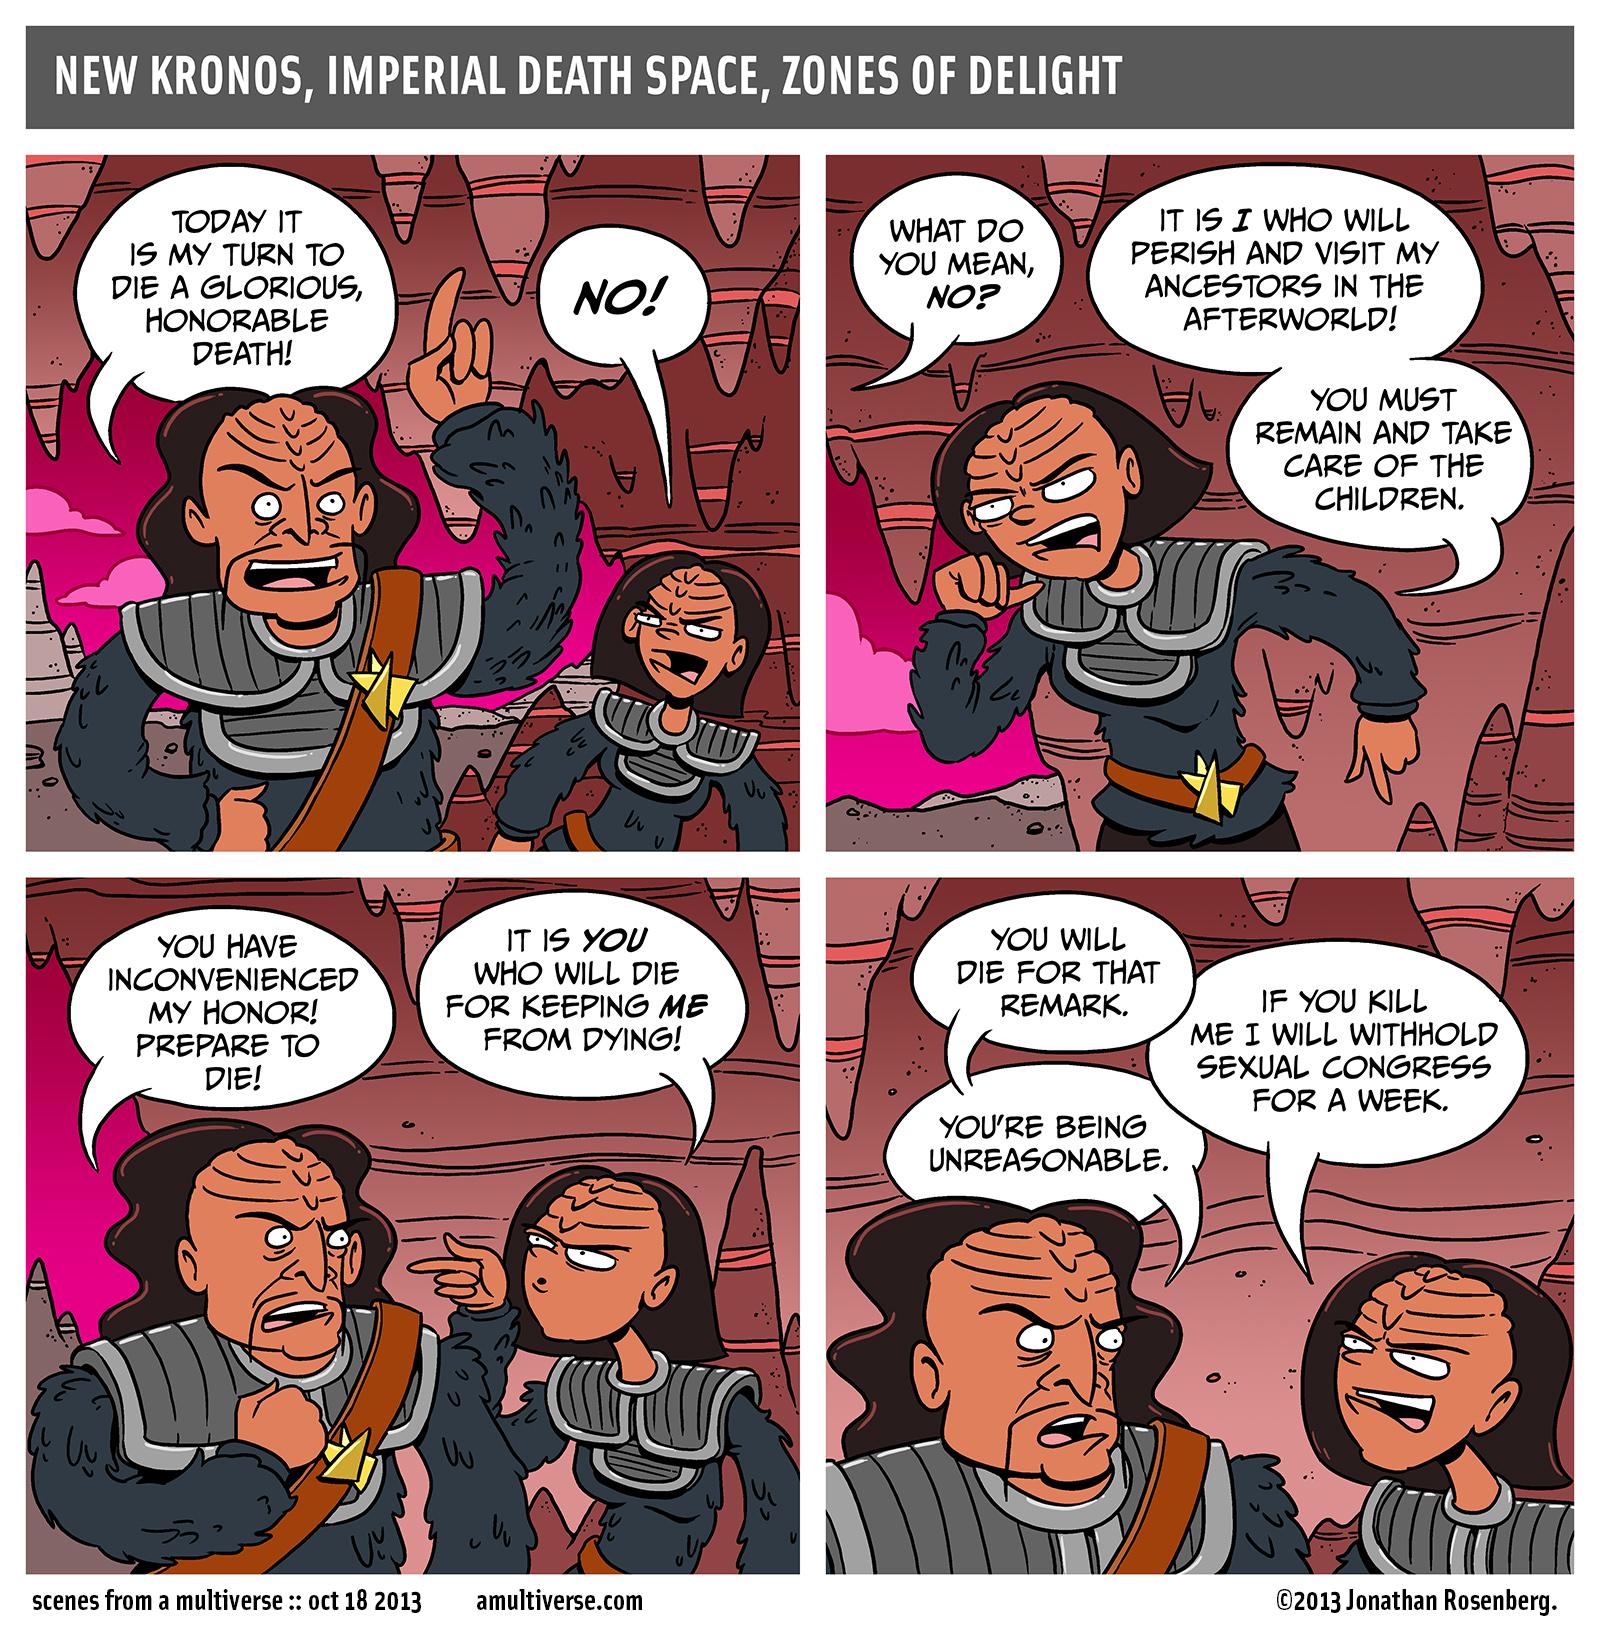 star wars needs more klingons